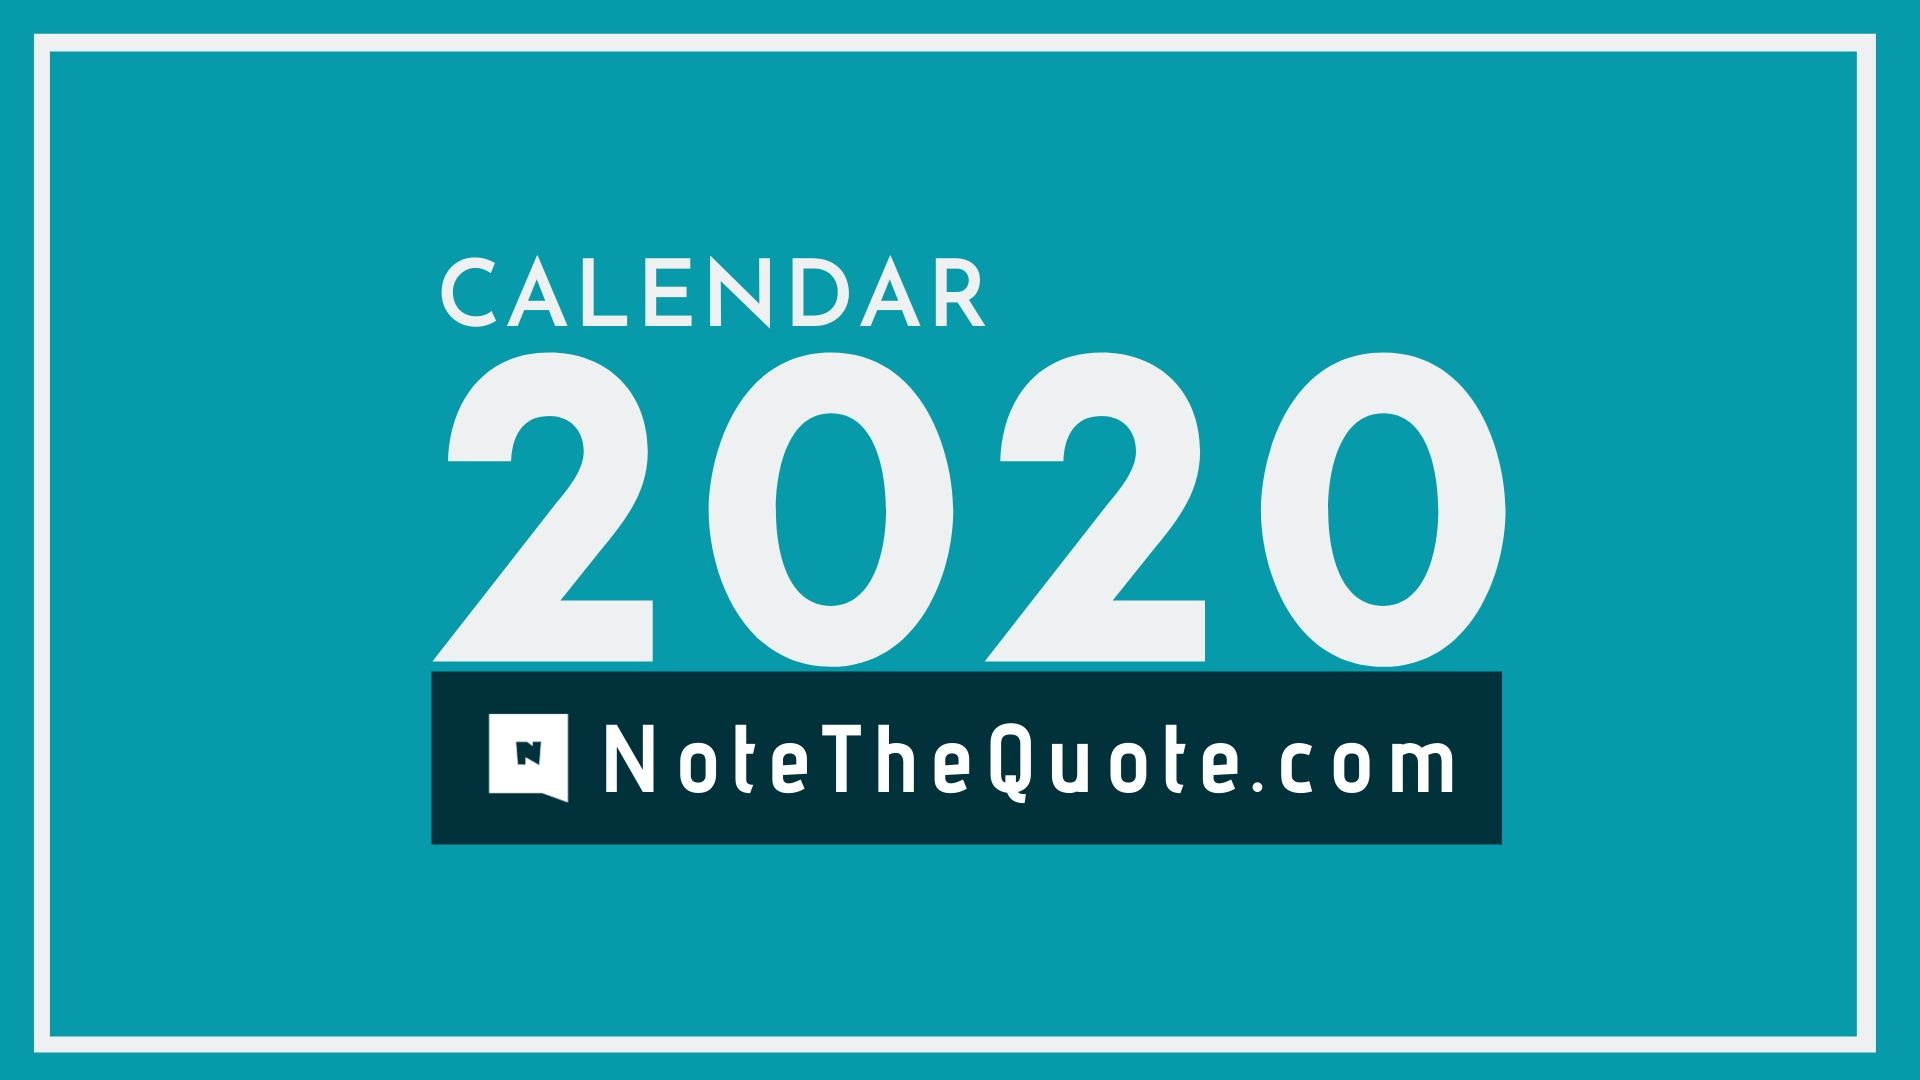 NoteTheQuote.com-Calendar-2020-banner-image